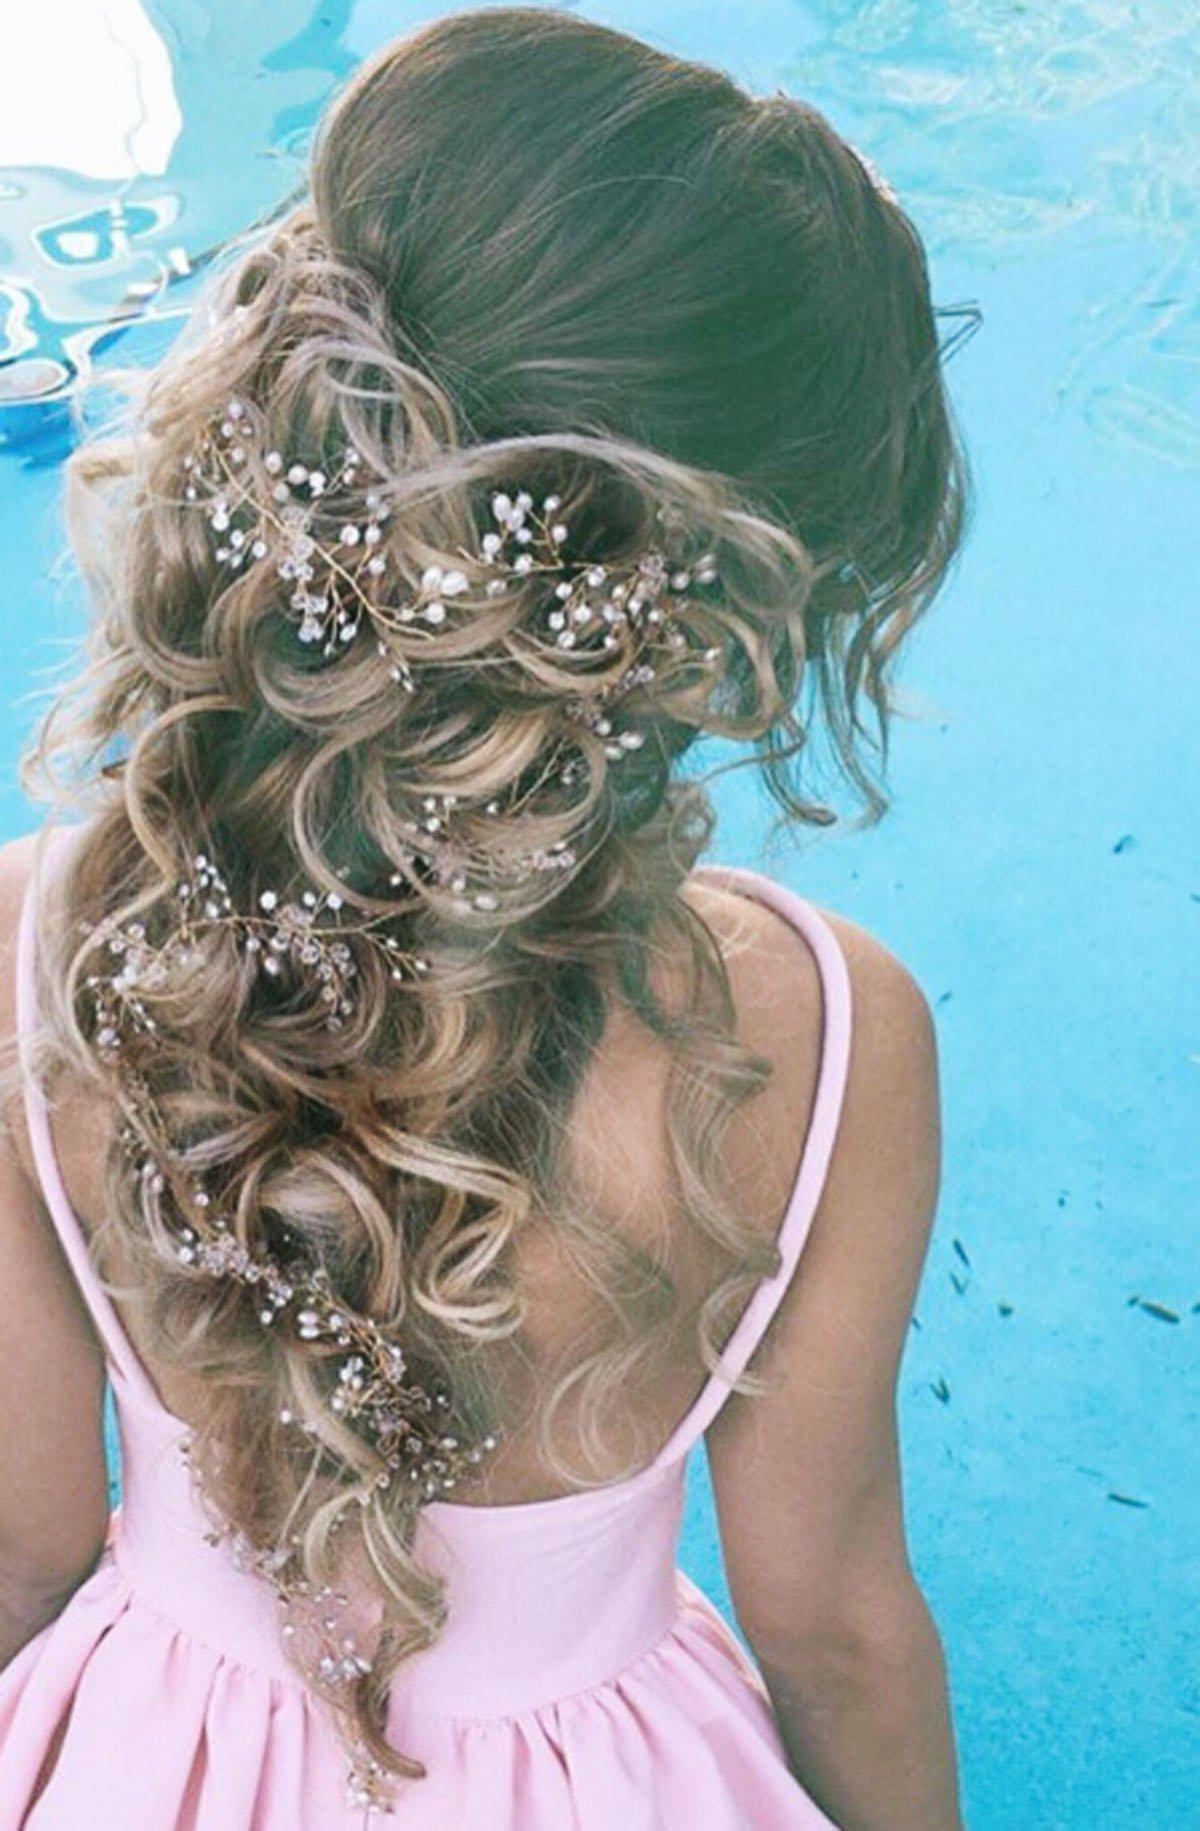 Amazon.com   Yean Bridal Wedding Hair Accessories Rhinestone Updo Headband  Headpieces for Bride and Flower Girl (Silver)   Beauty 7efa8f362b18